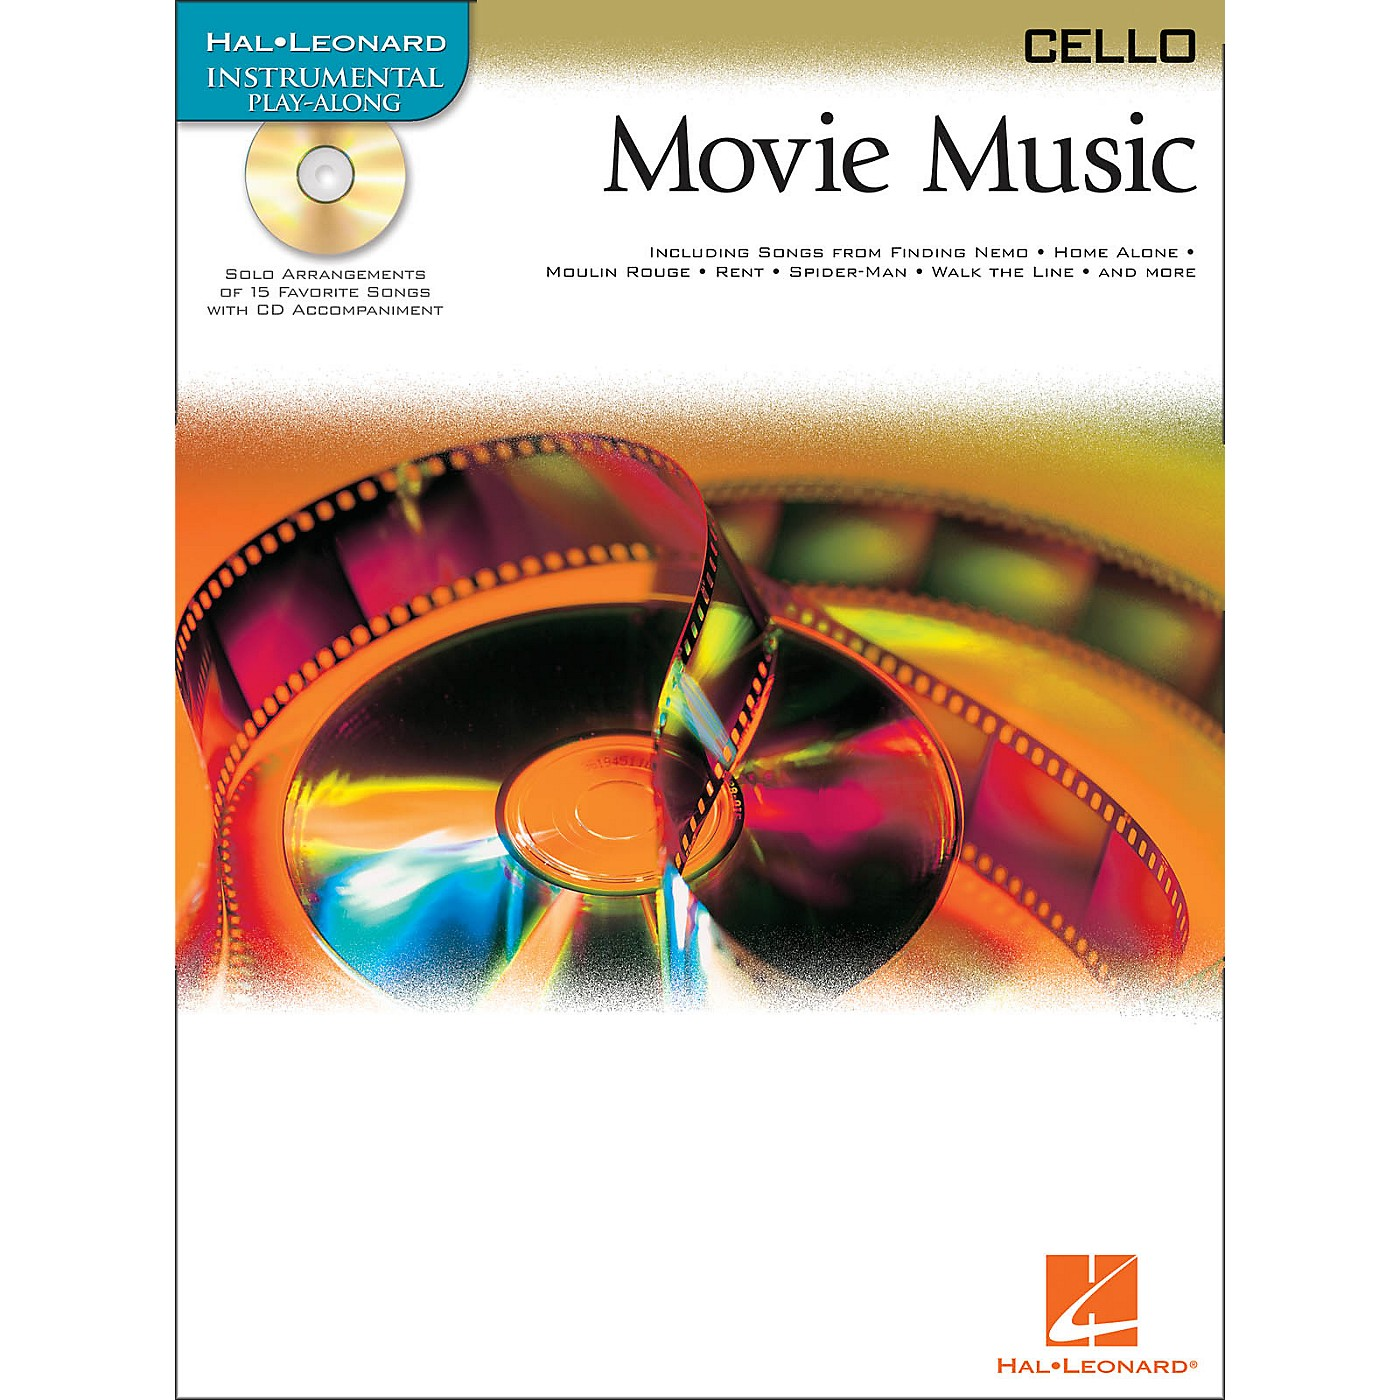 Hal Leonard Movie Music for Cello Book/CD thumbnail